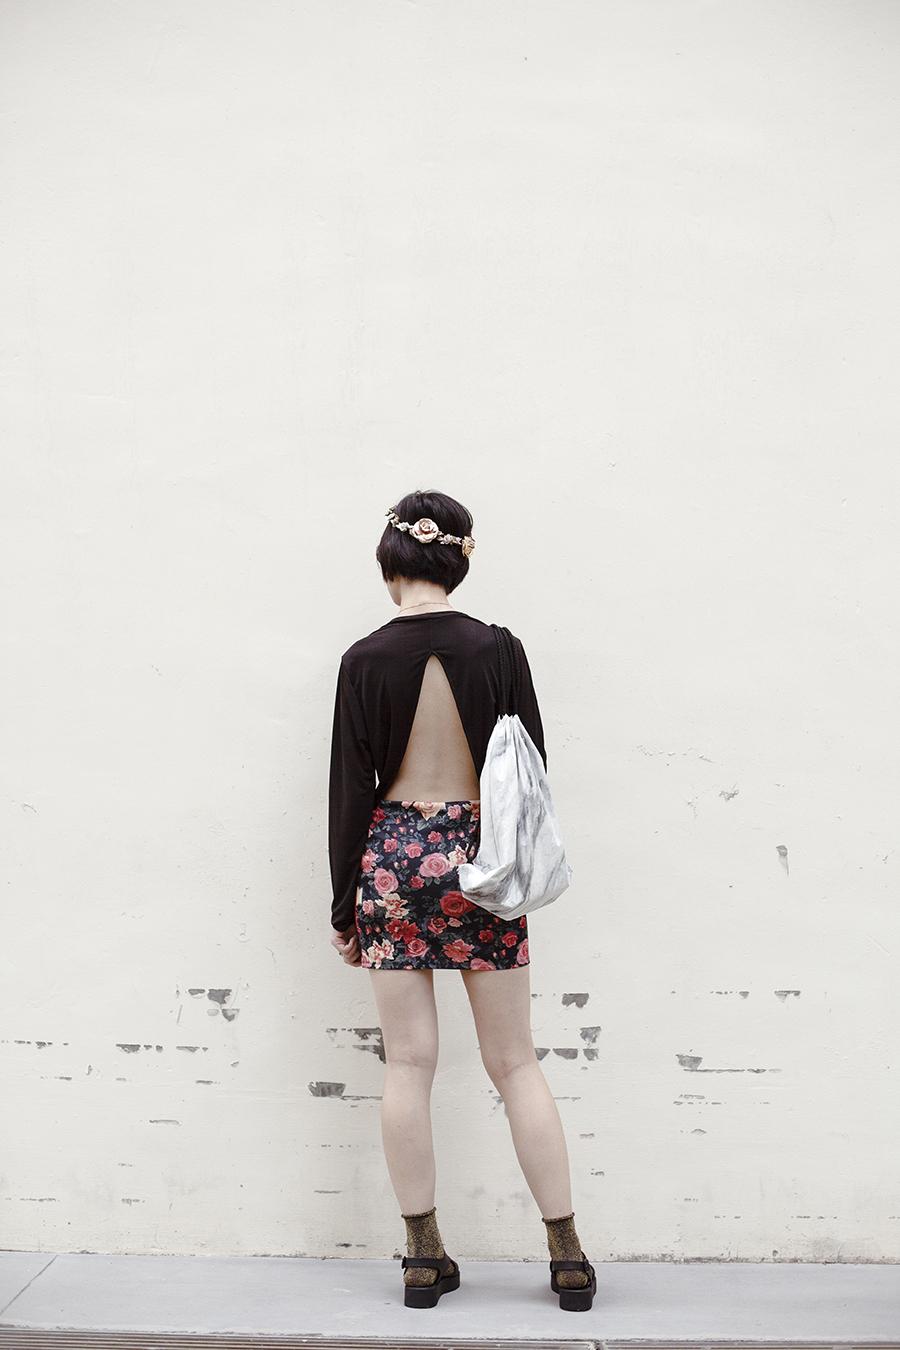 Boho chic outfit: Forever 21 open back top, ALDO Yboniel Necklace, Snupped white marble drawstring bag, Forever 21 floral skirt, River Island Metallic Flower Headband, Topshop Roll Top Glitter Socks, Melissa Hotness Platform Sandals